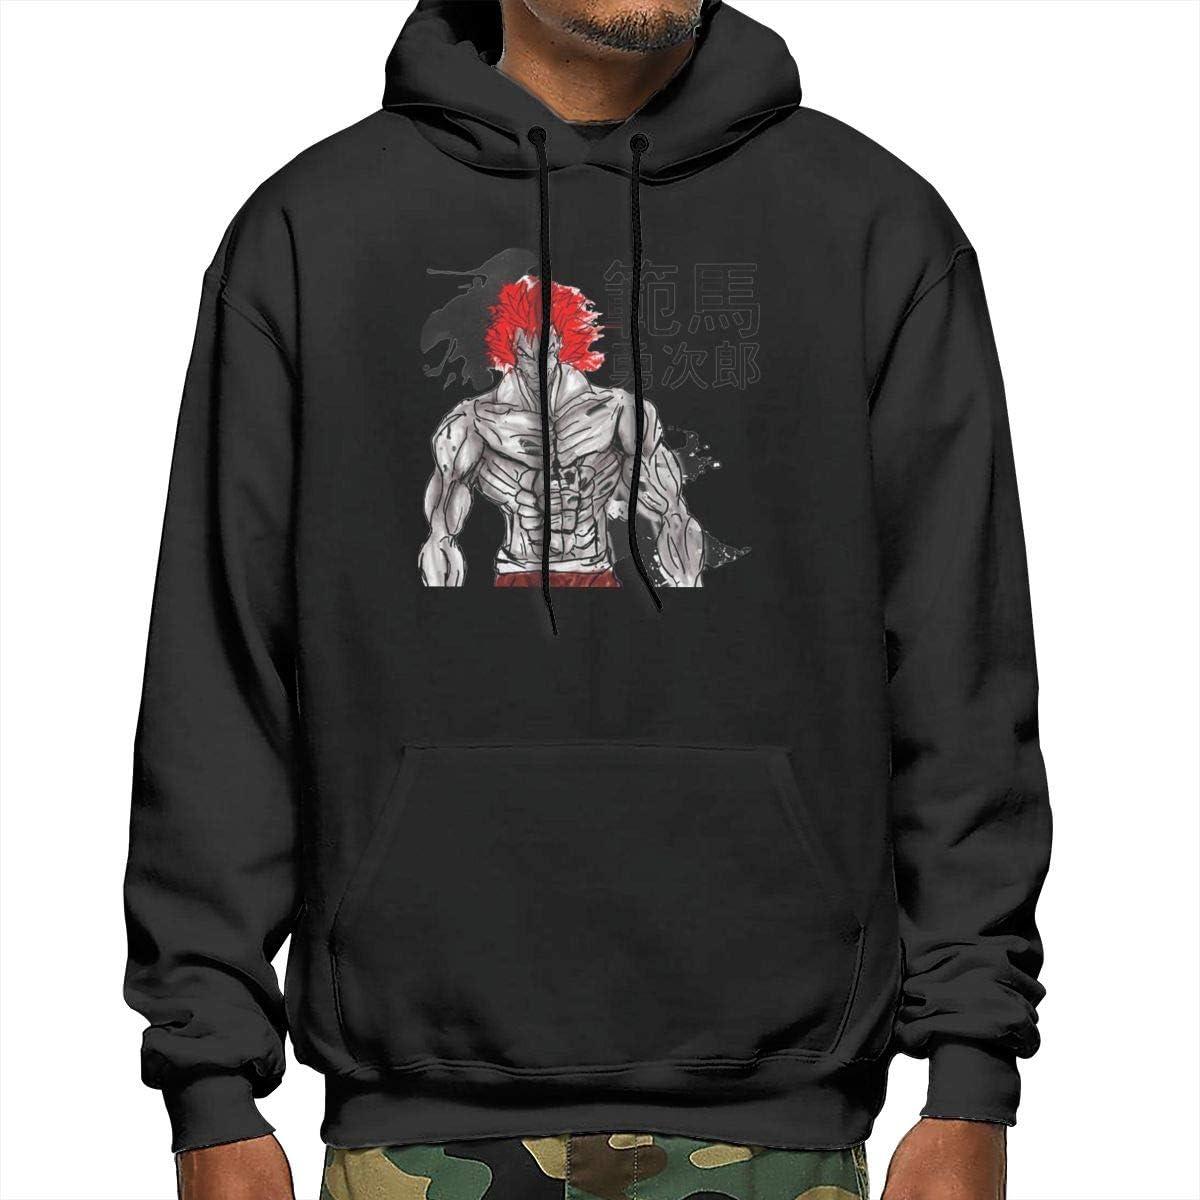 CRK008 Anime Grappler Baki Baki Hanma Mens Sweater Hoody Pullover